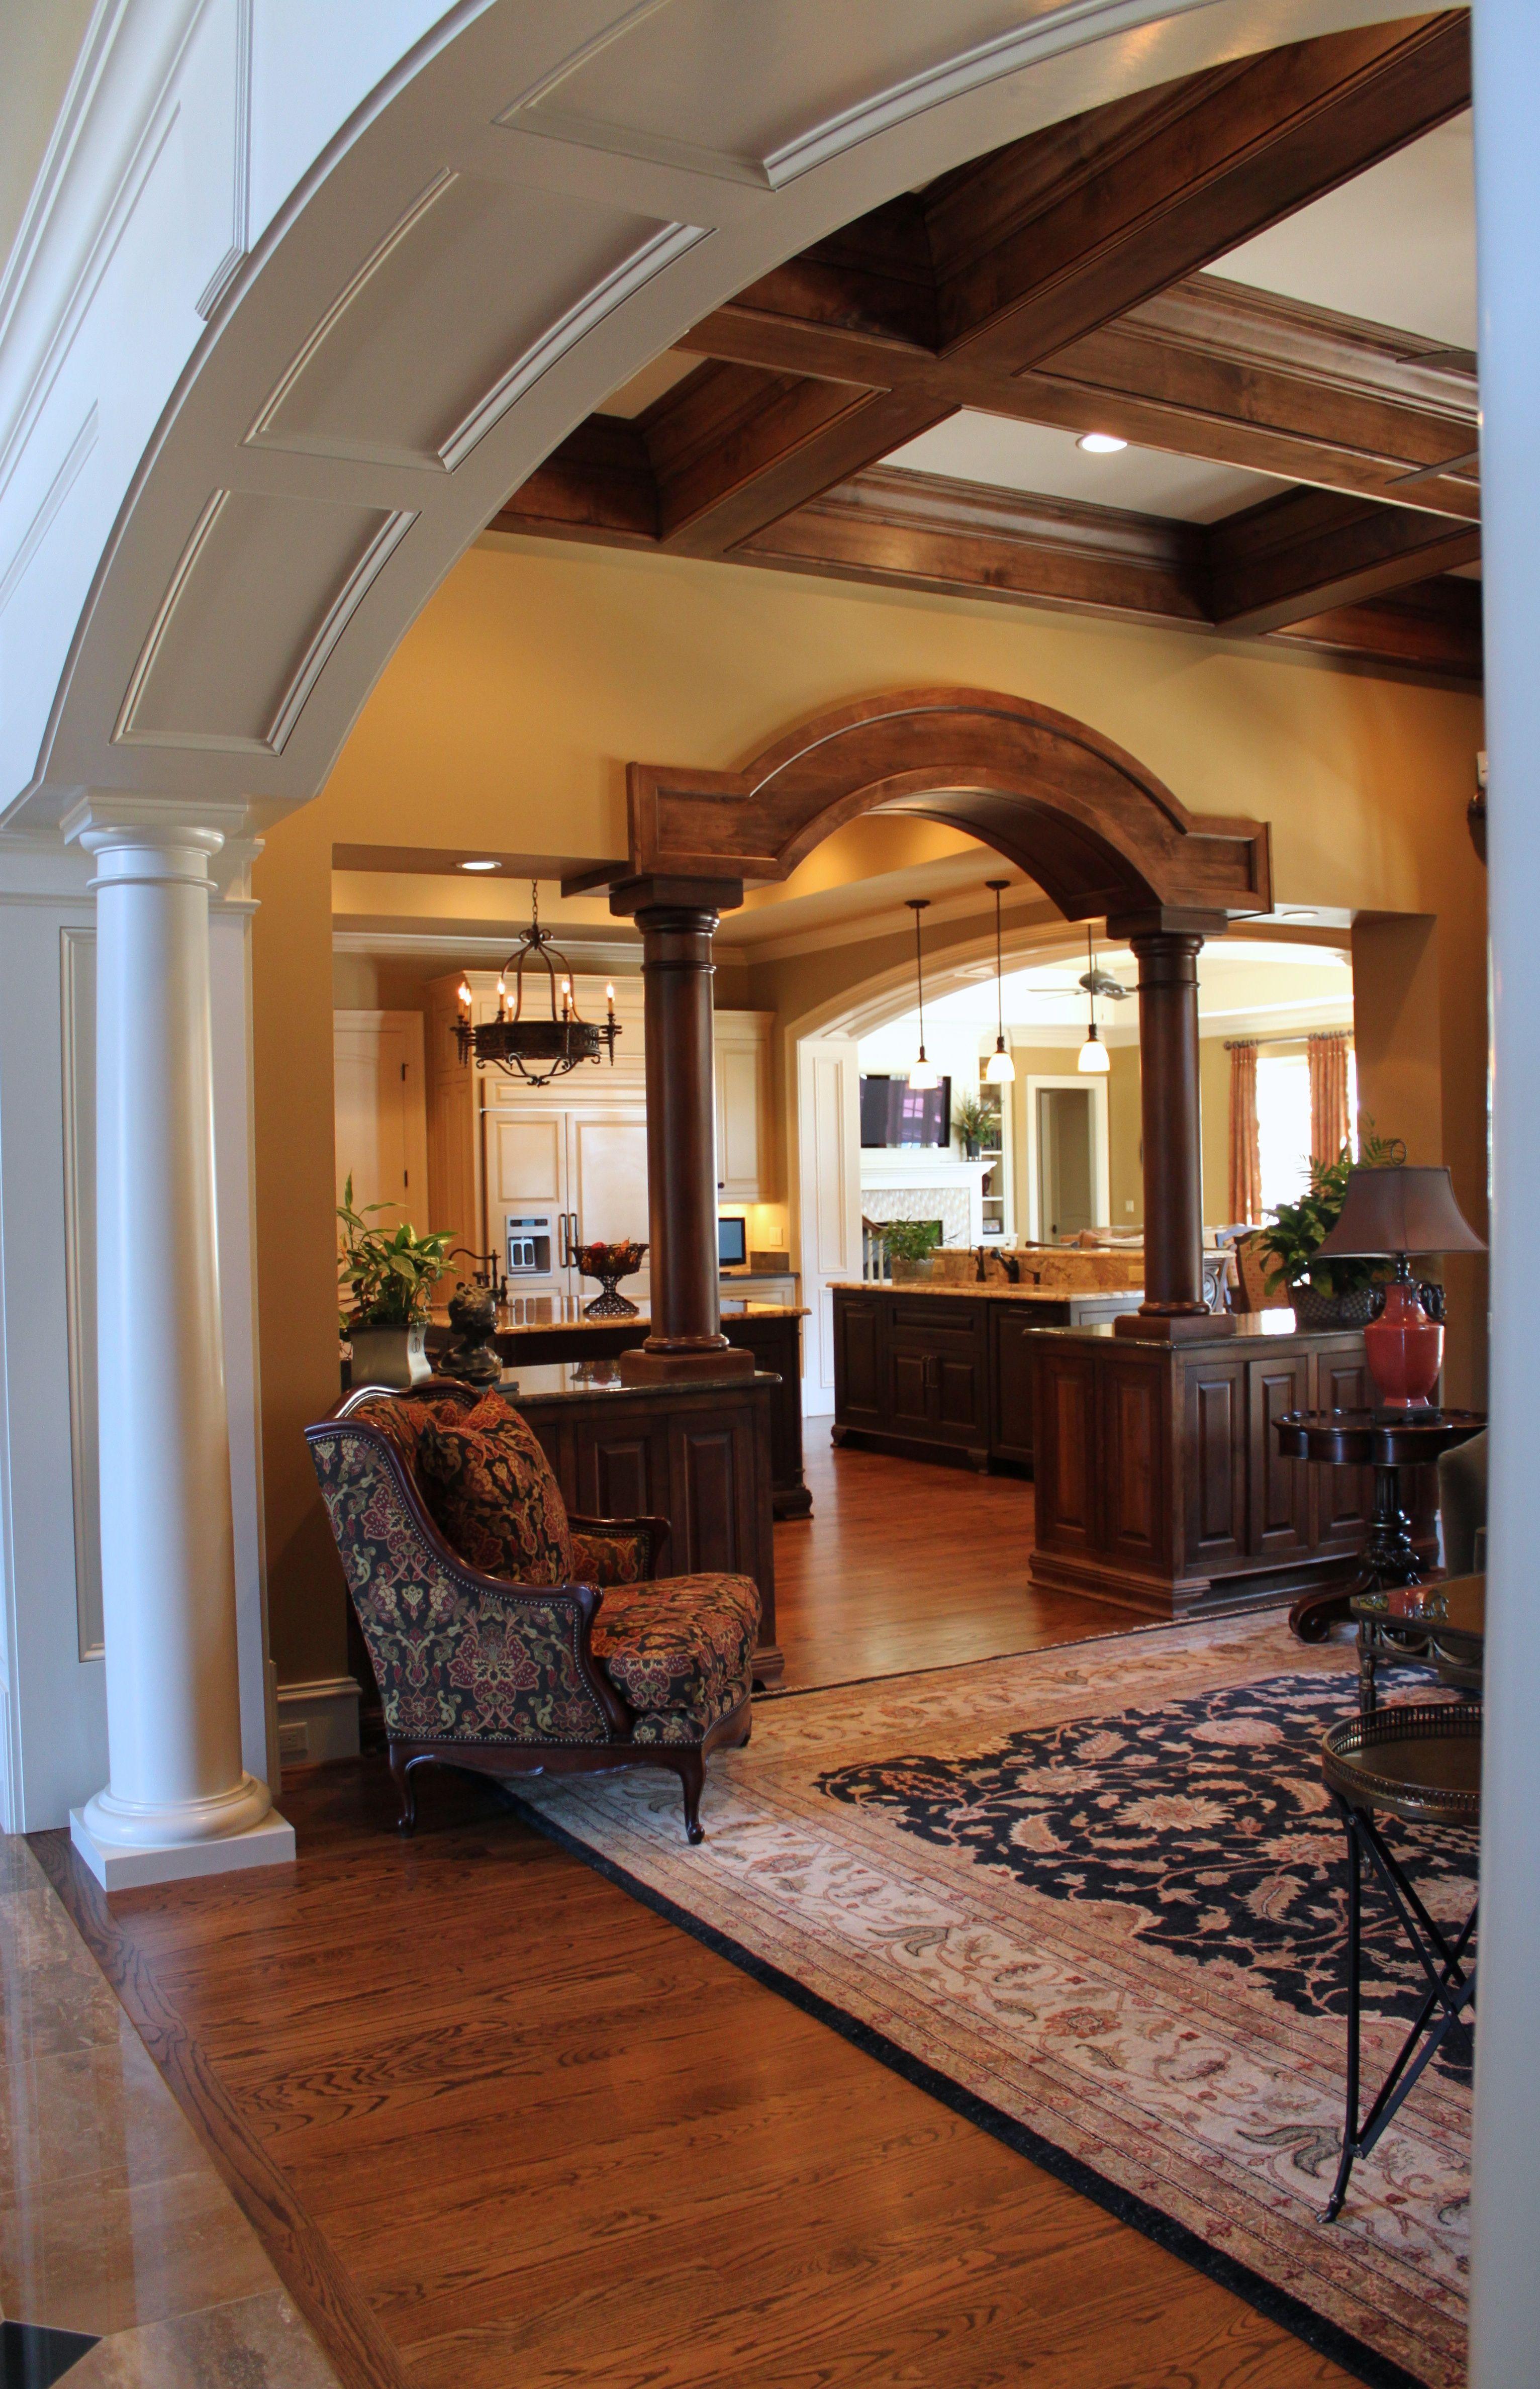 Interior Design U2022 Greenville, SC U2022 Kilgore Plantation U2022 Interior Cues, LLC  #architecture